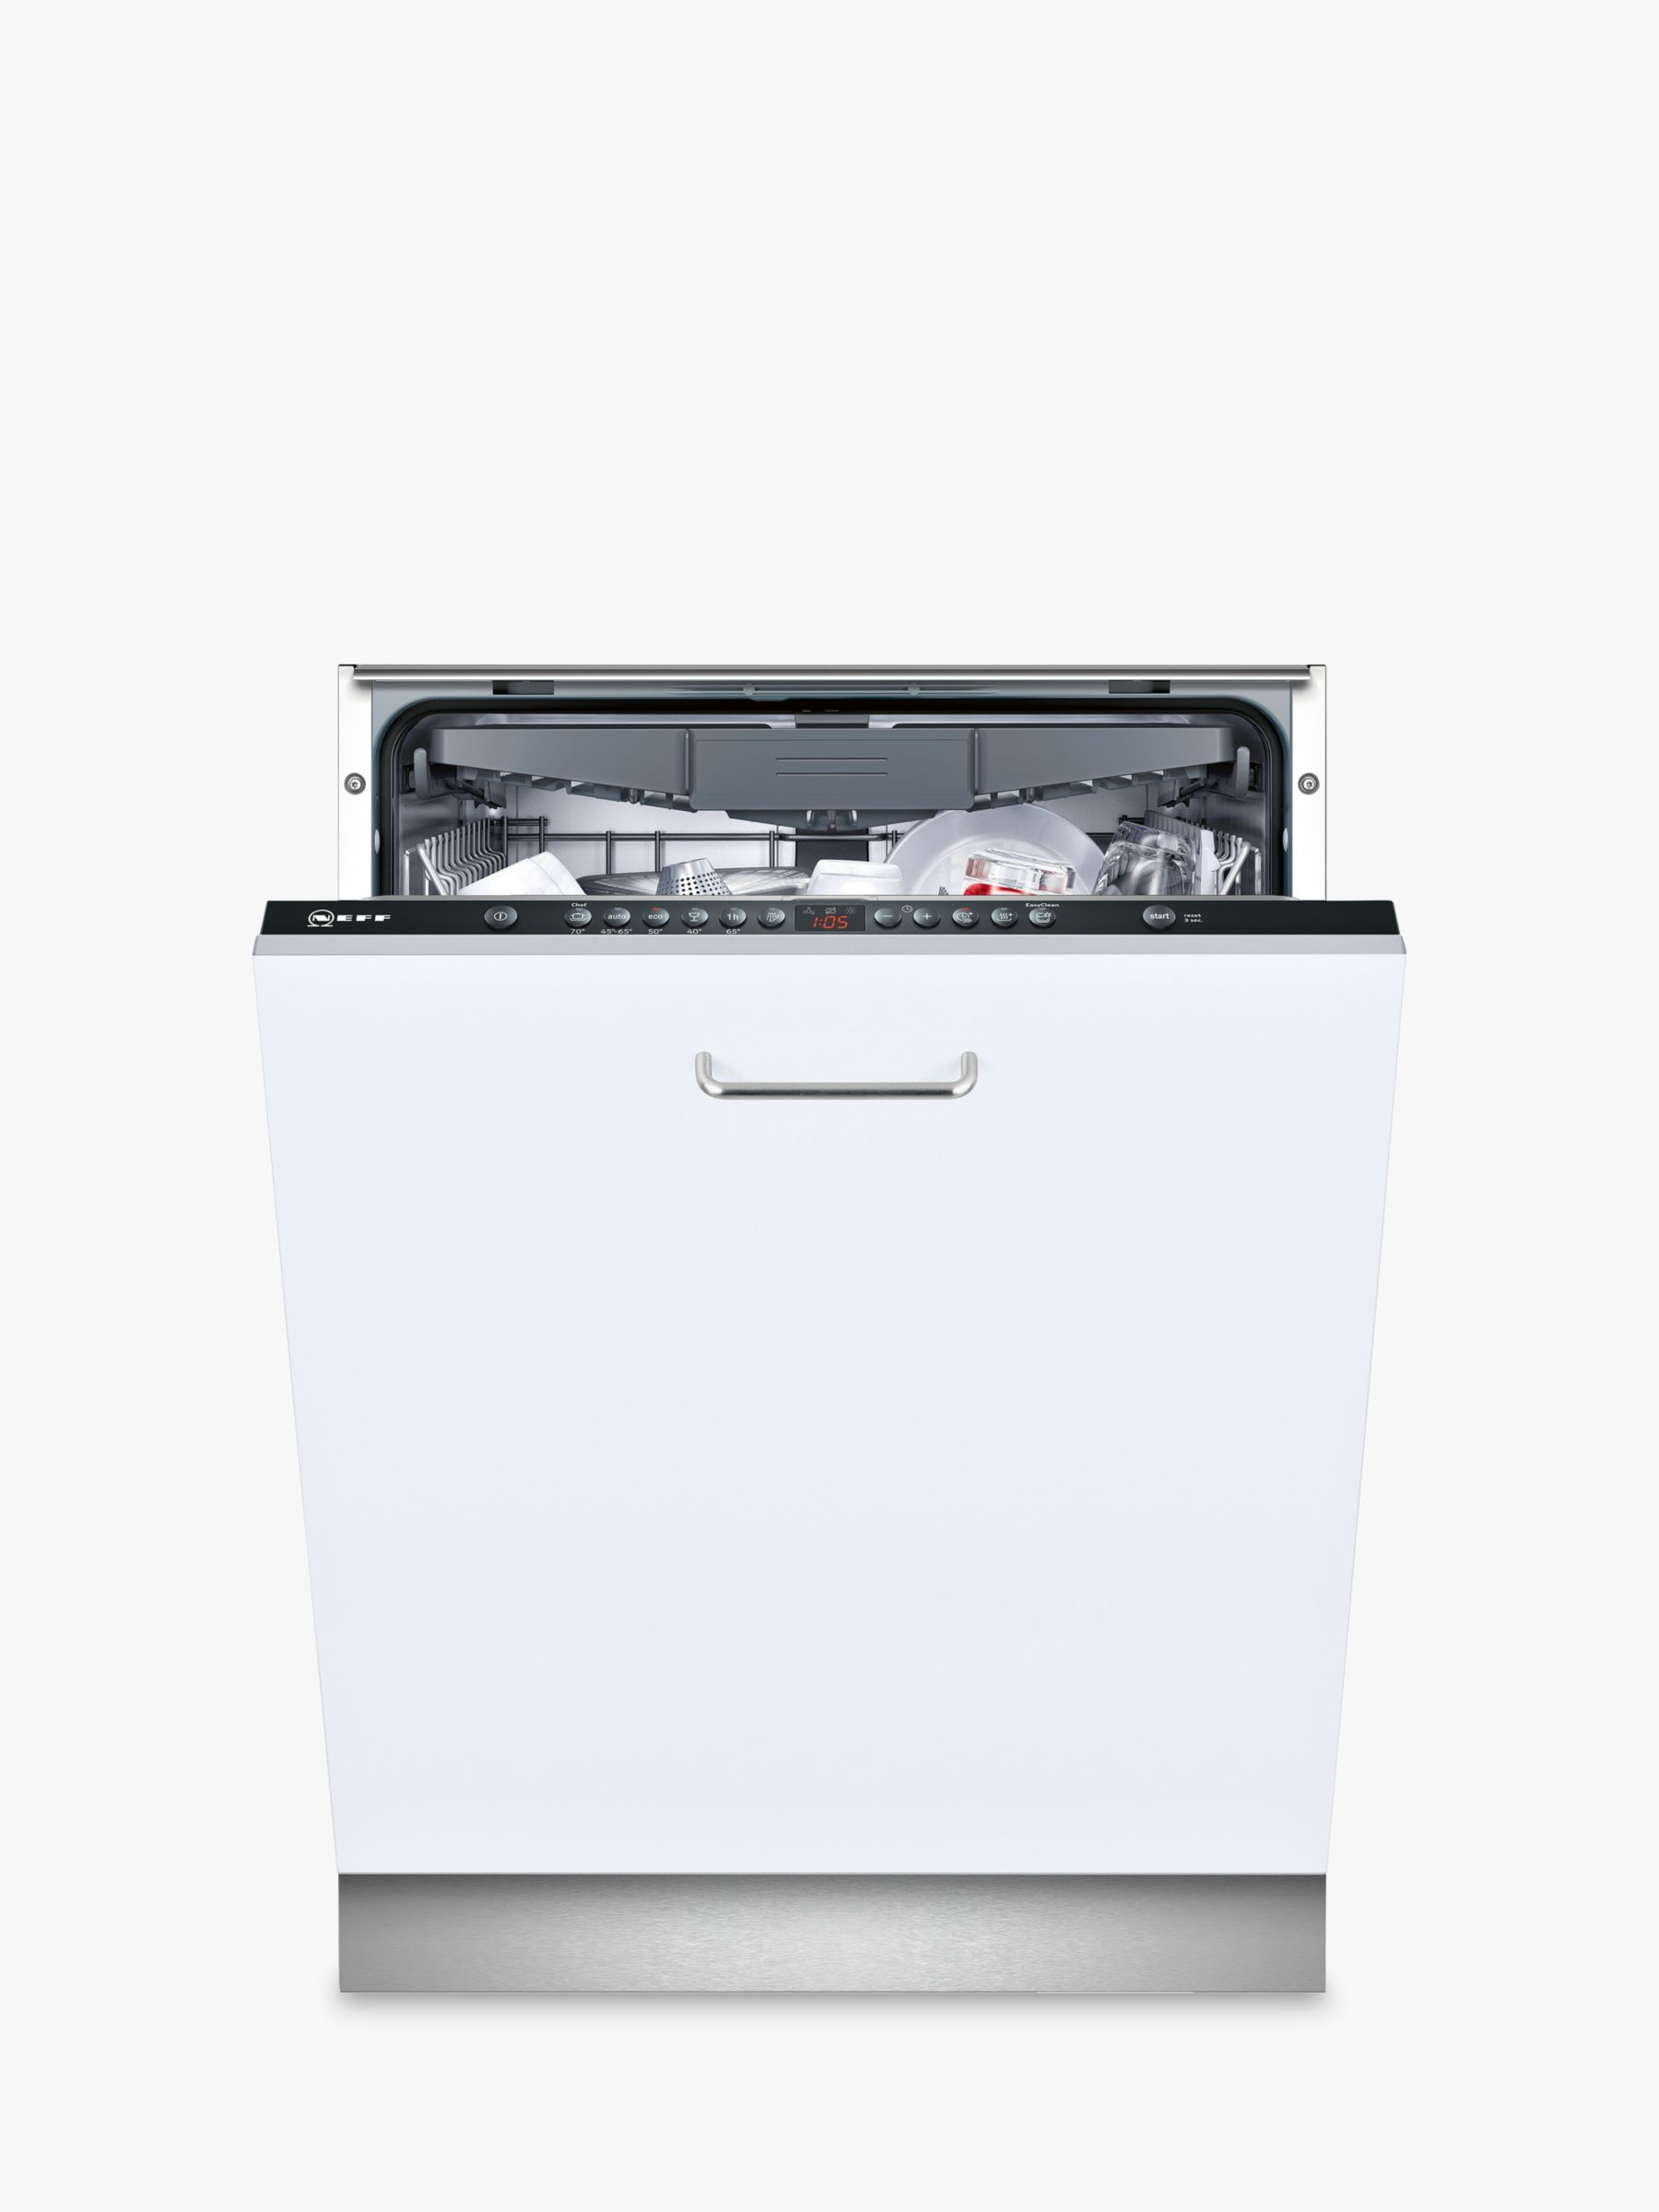 NEFF Neff S513K60X1G Integrated Dishwasher, Black